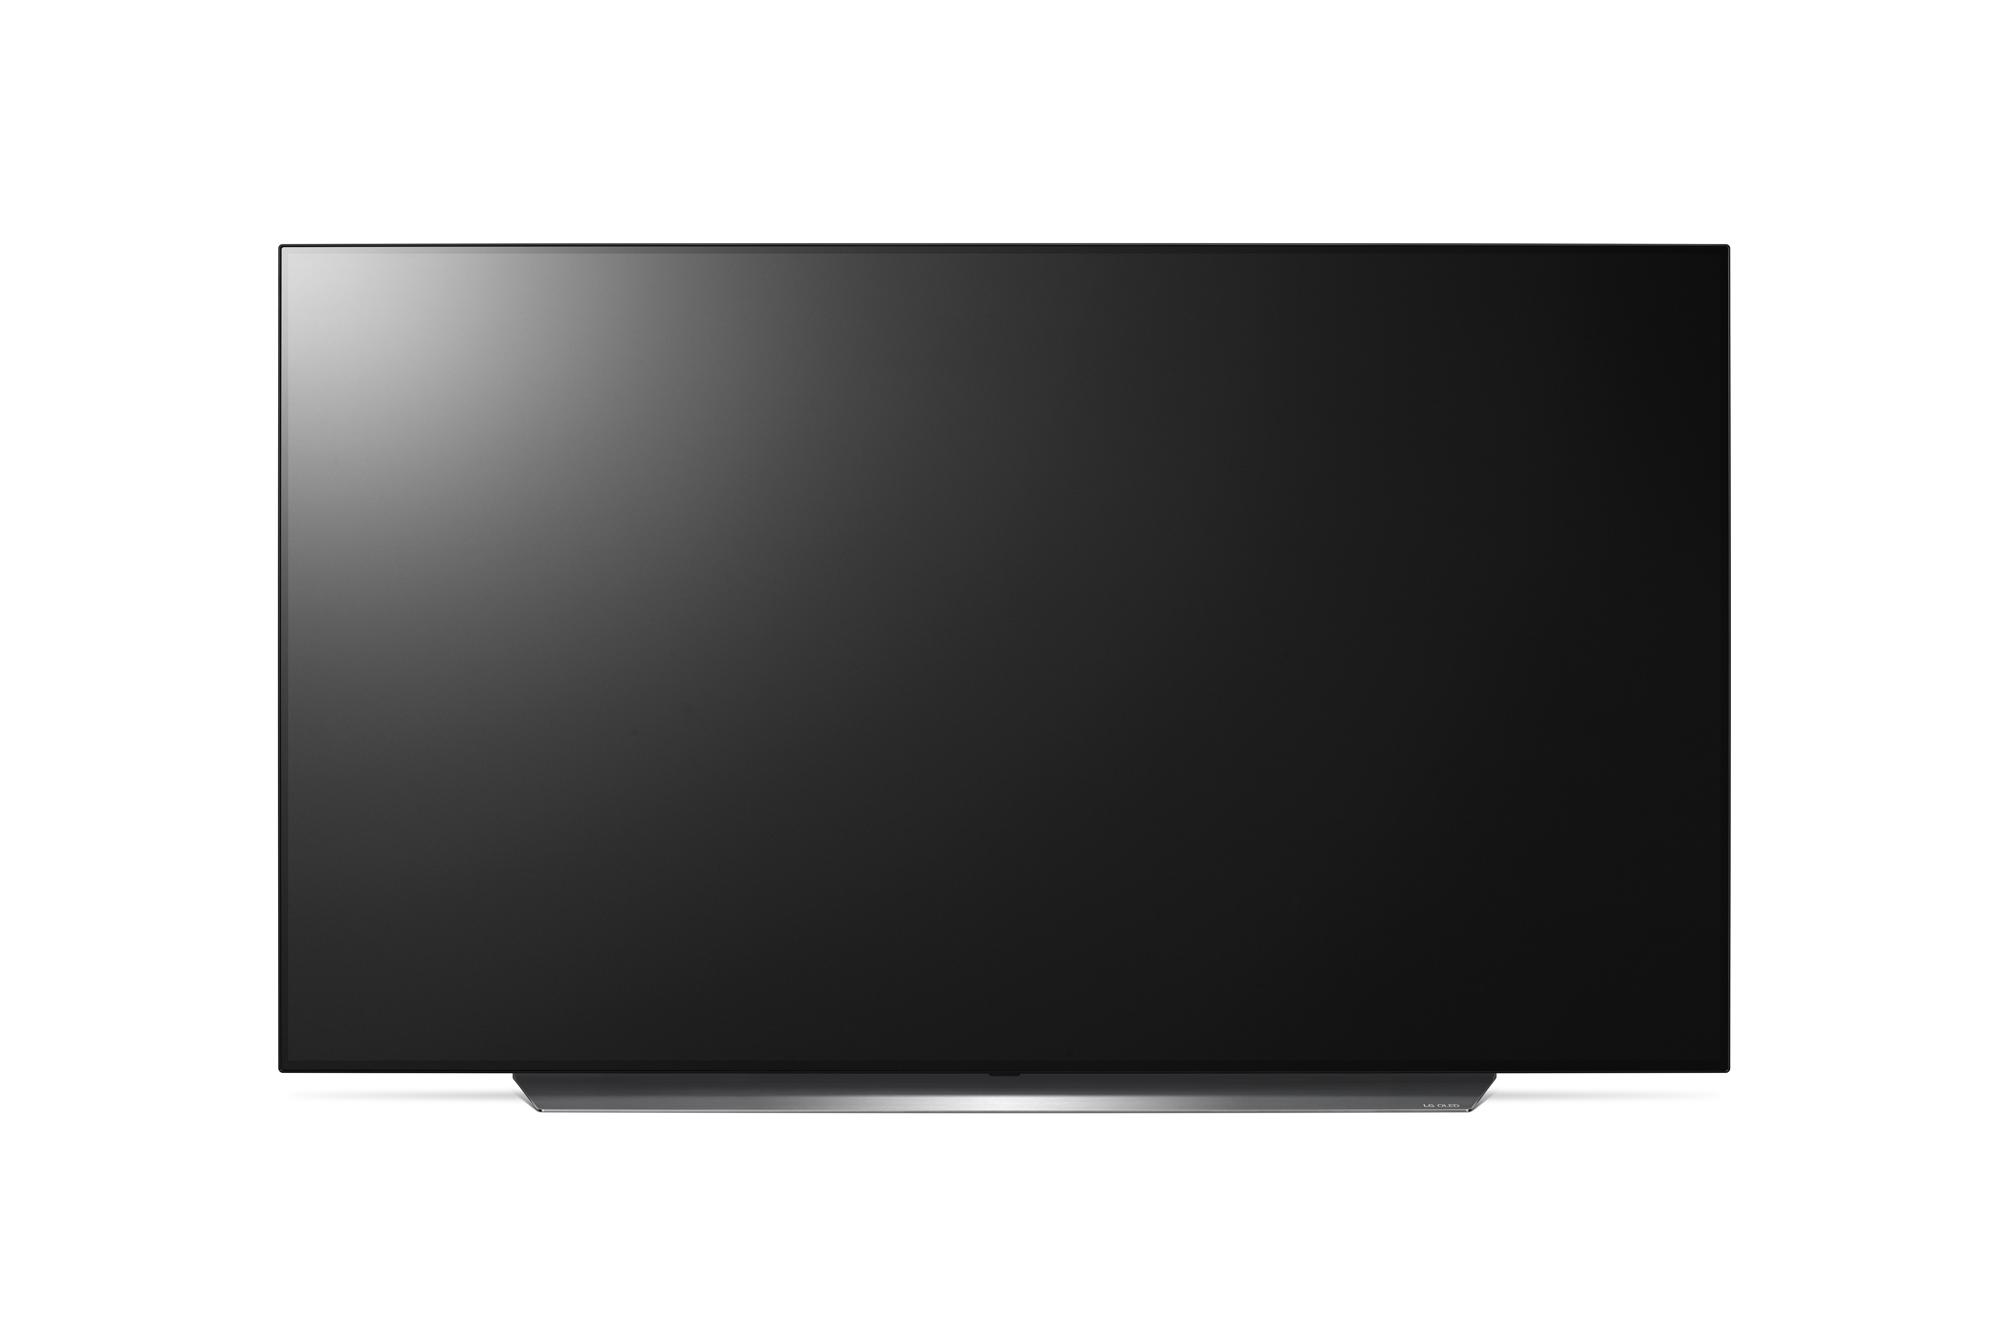 LG Pro:Centric SMART 65ET960H (NA) 2